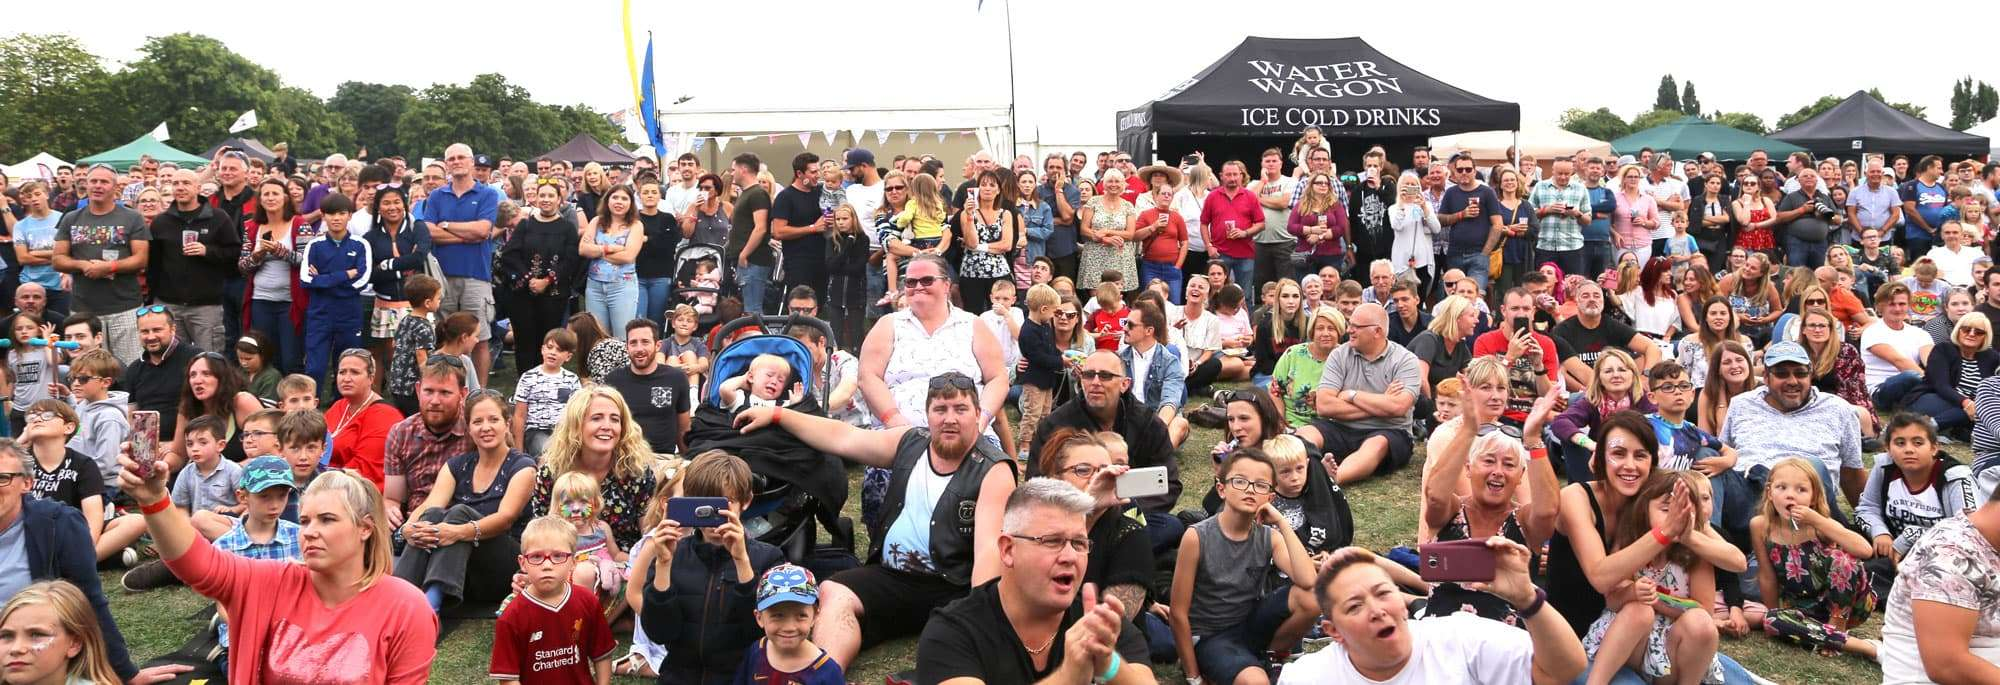 BBQ Festival crowd - Smoke and Fire Festival